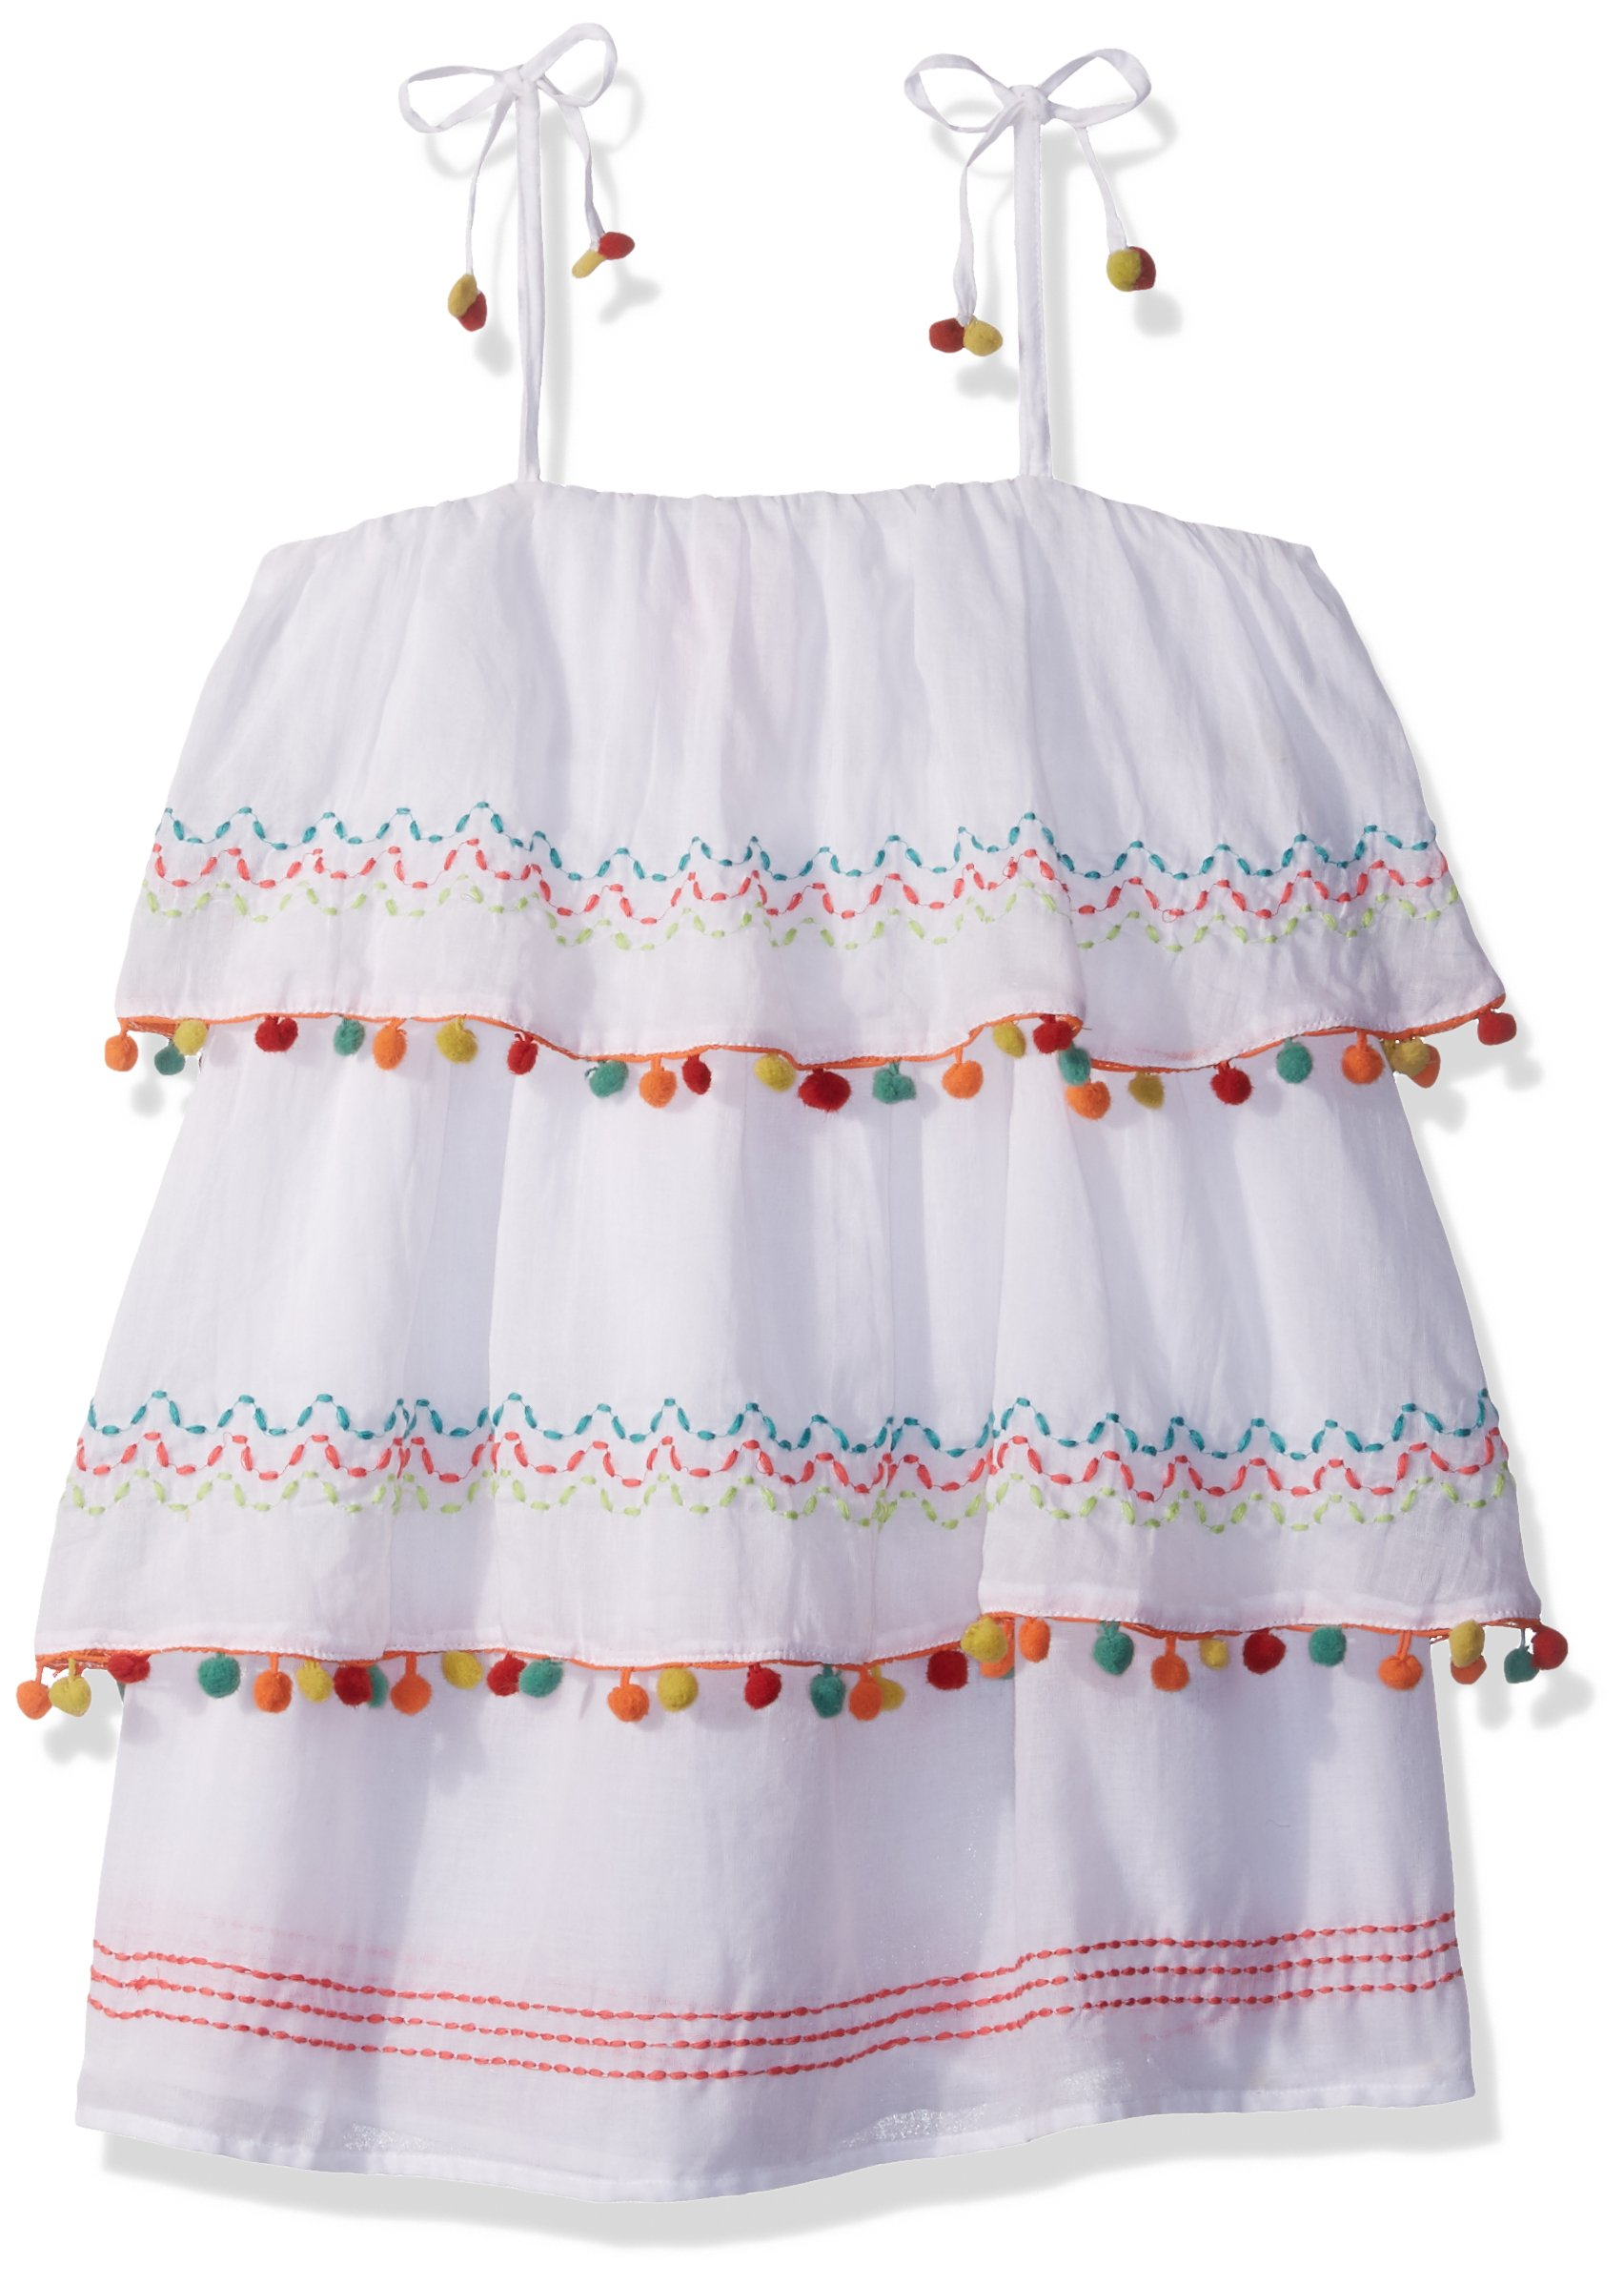 OndadeMar Little Girls' Short Dress Cover-up, Amazonia, 8